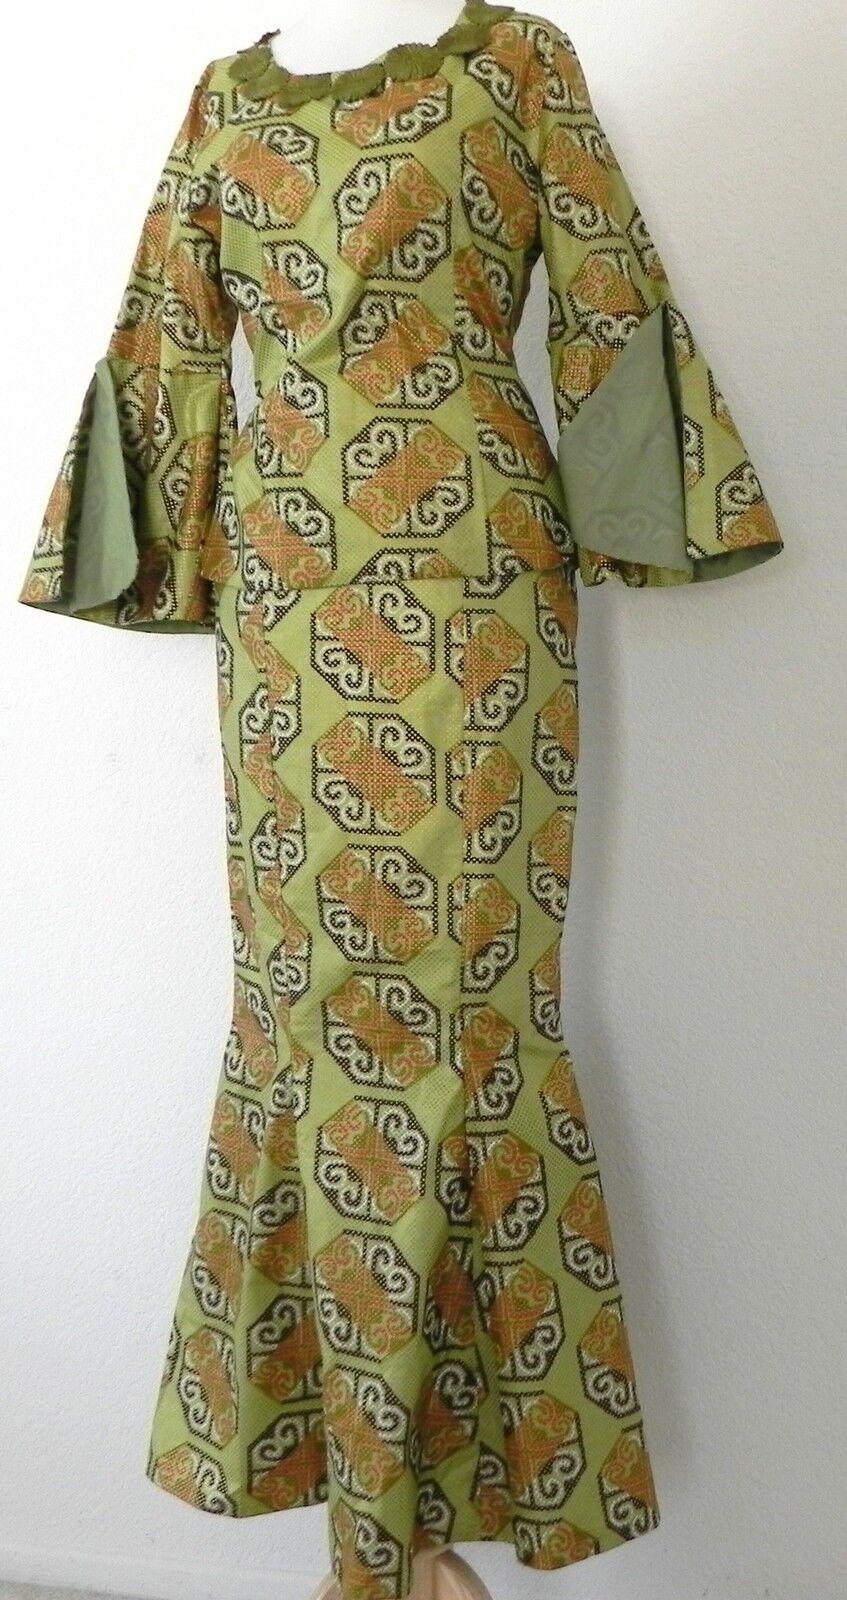 Vtg Hippie Skirt Suit Bell sleeve Top Mermaid Maxi Skirt Size XS S Multicolor